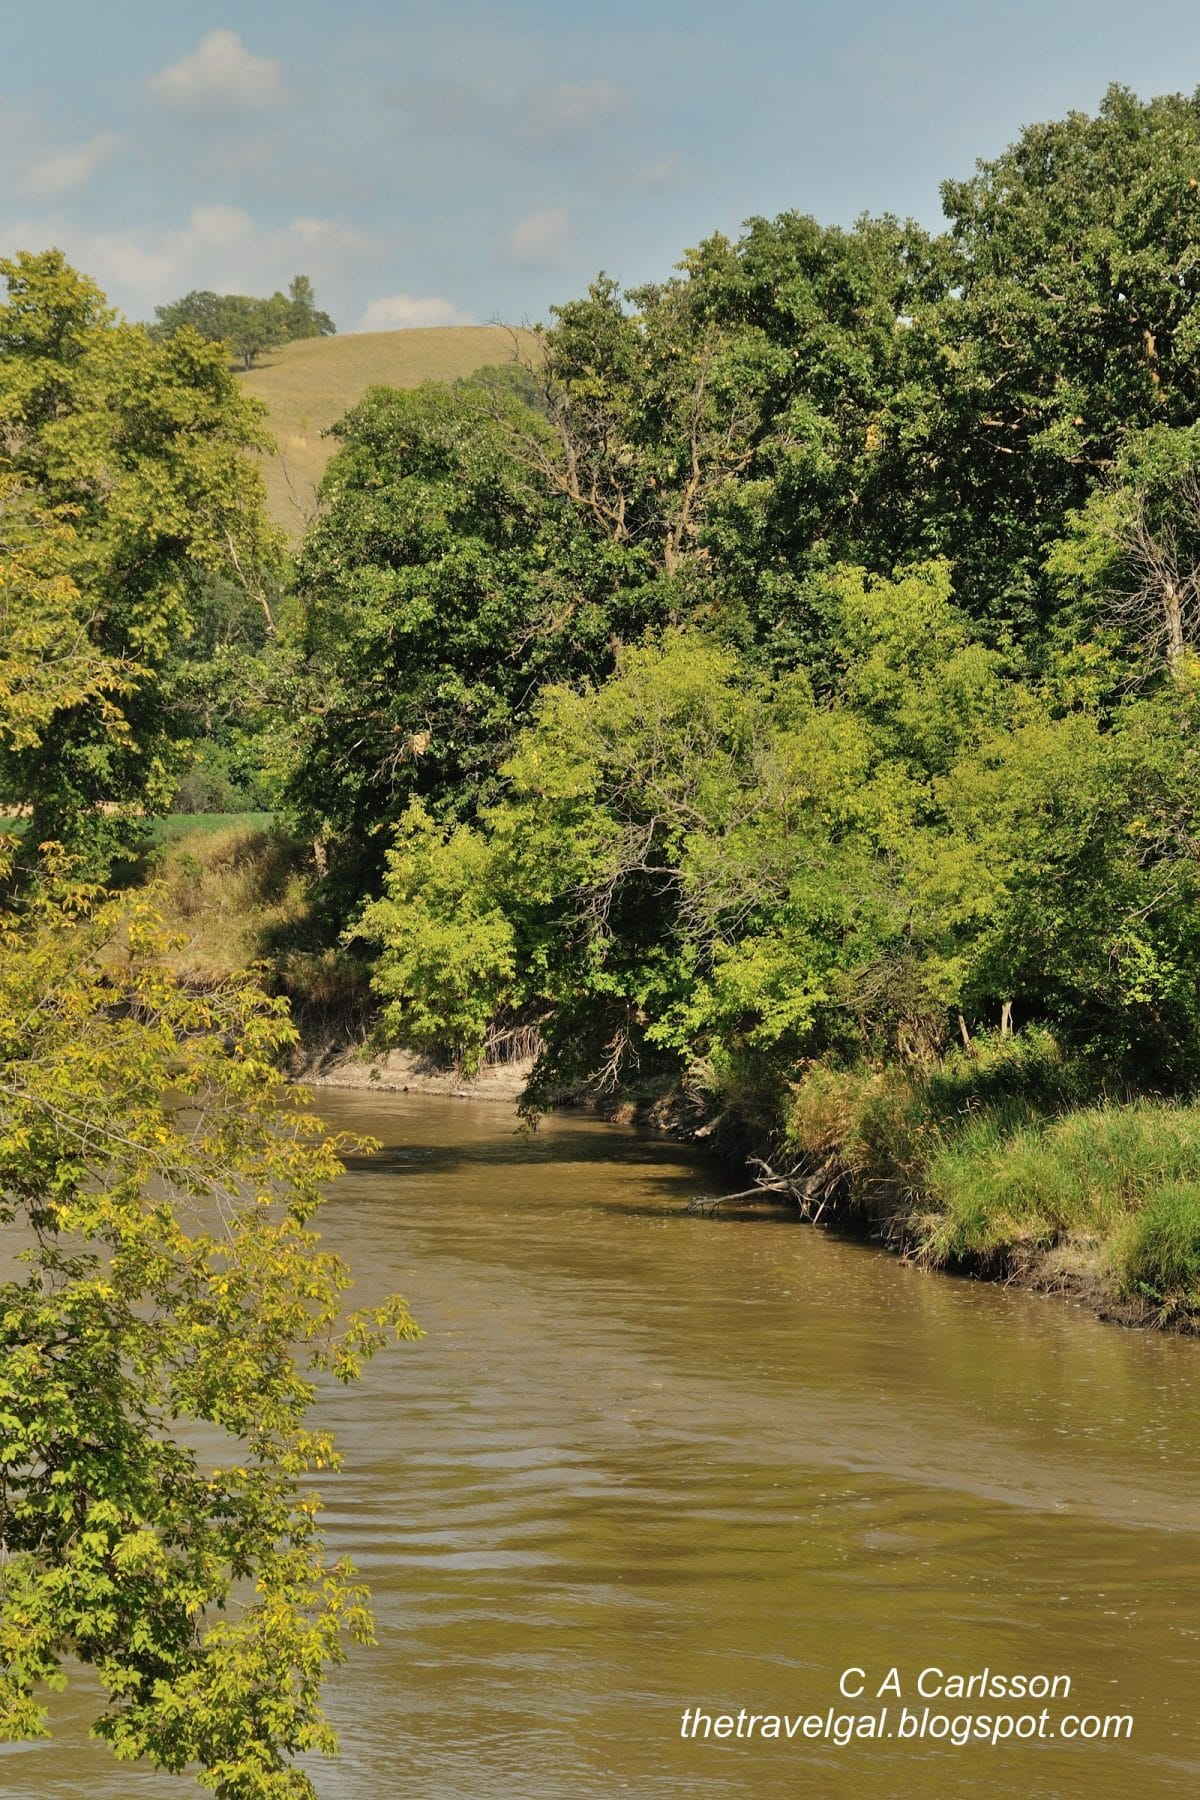 DSC_5161 Sheyenne River in Fort Ransom in North Dakota